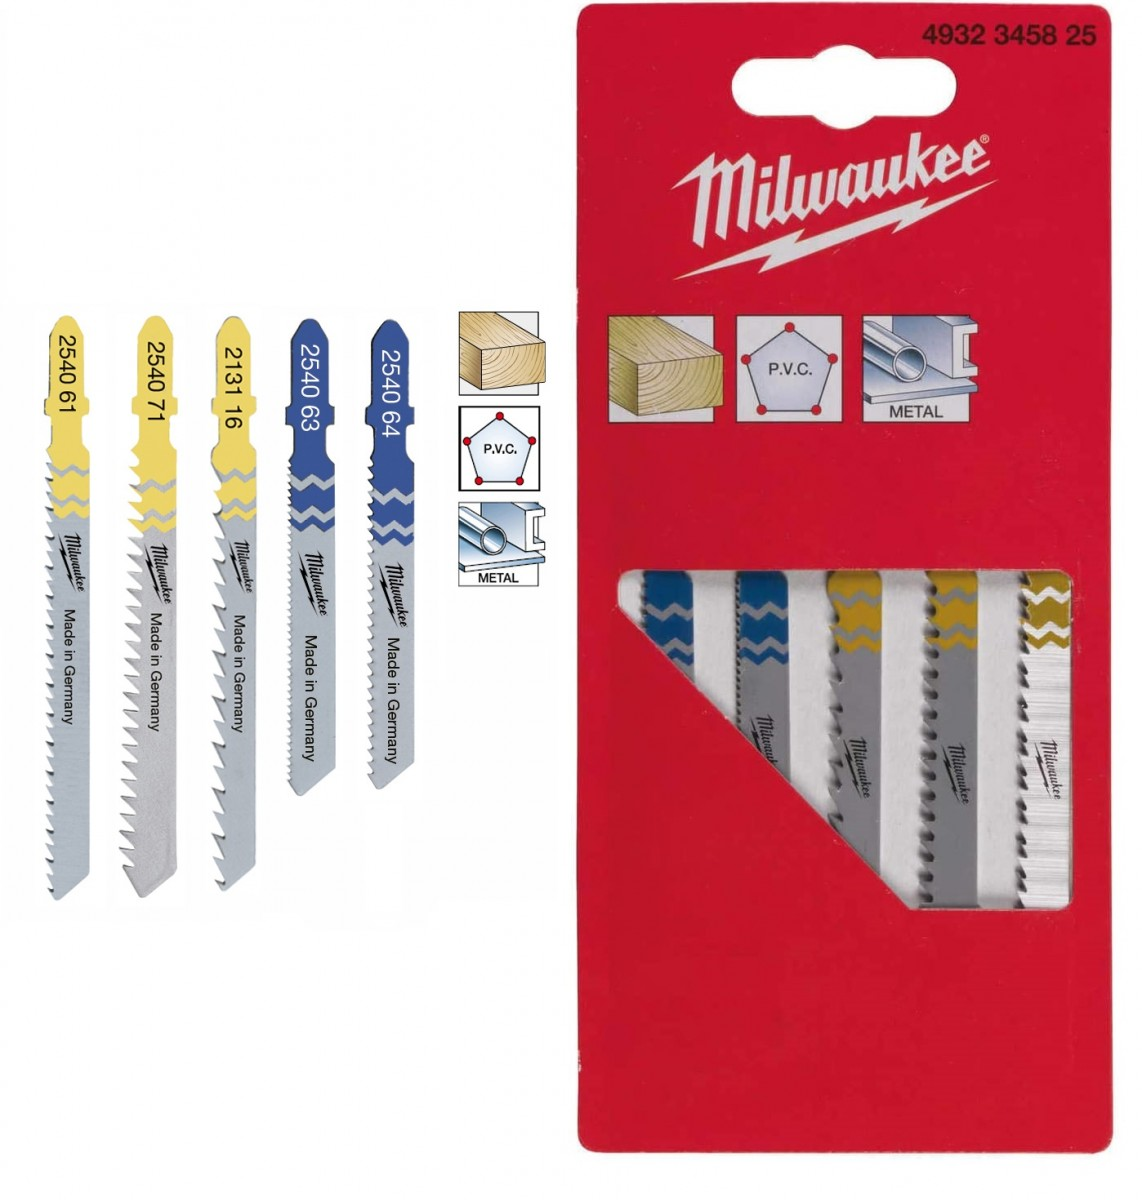 MILWAUKEE pilové plátky MIX pro přímočaré pily, sada 5 ksKg 4932345825